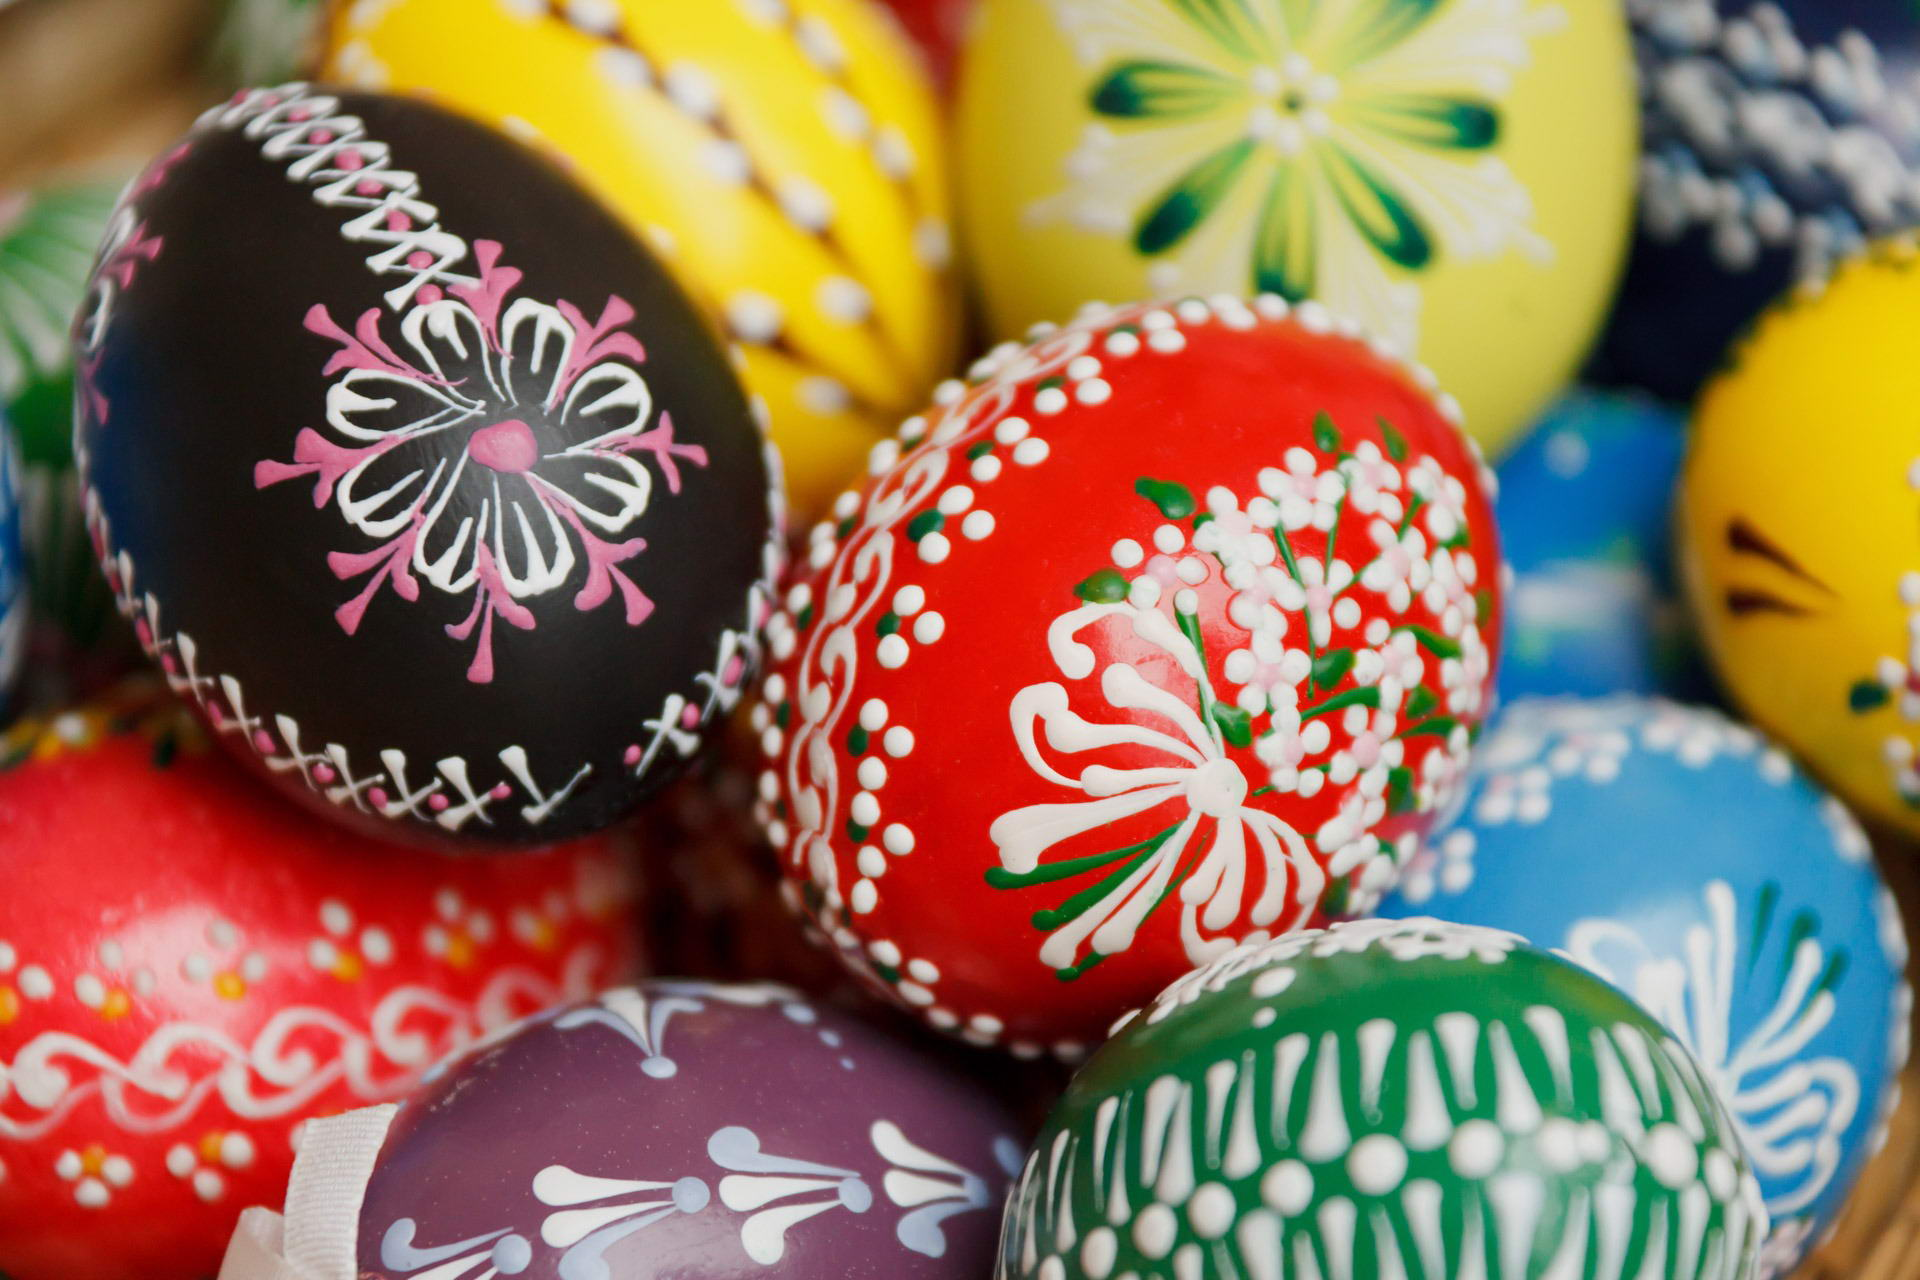 húsvéti kép húsvéti képeslap húsvéti képek